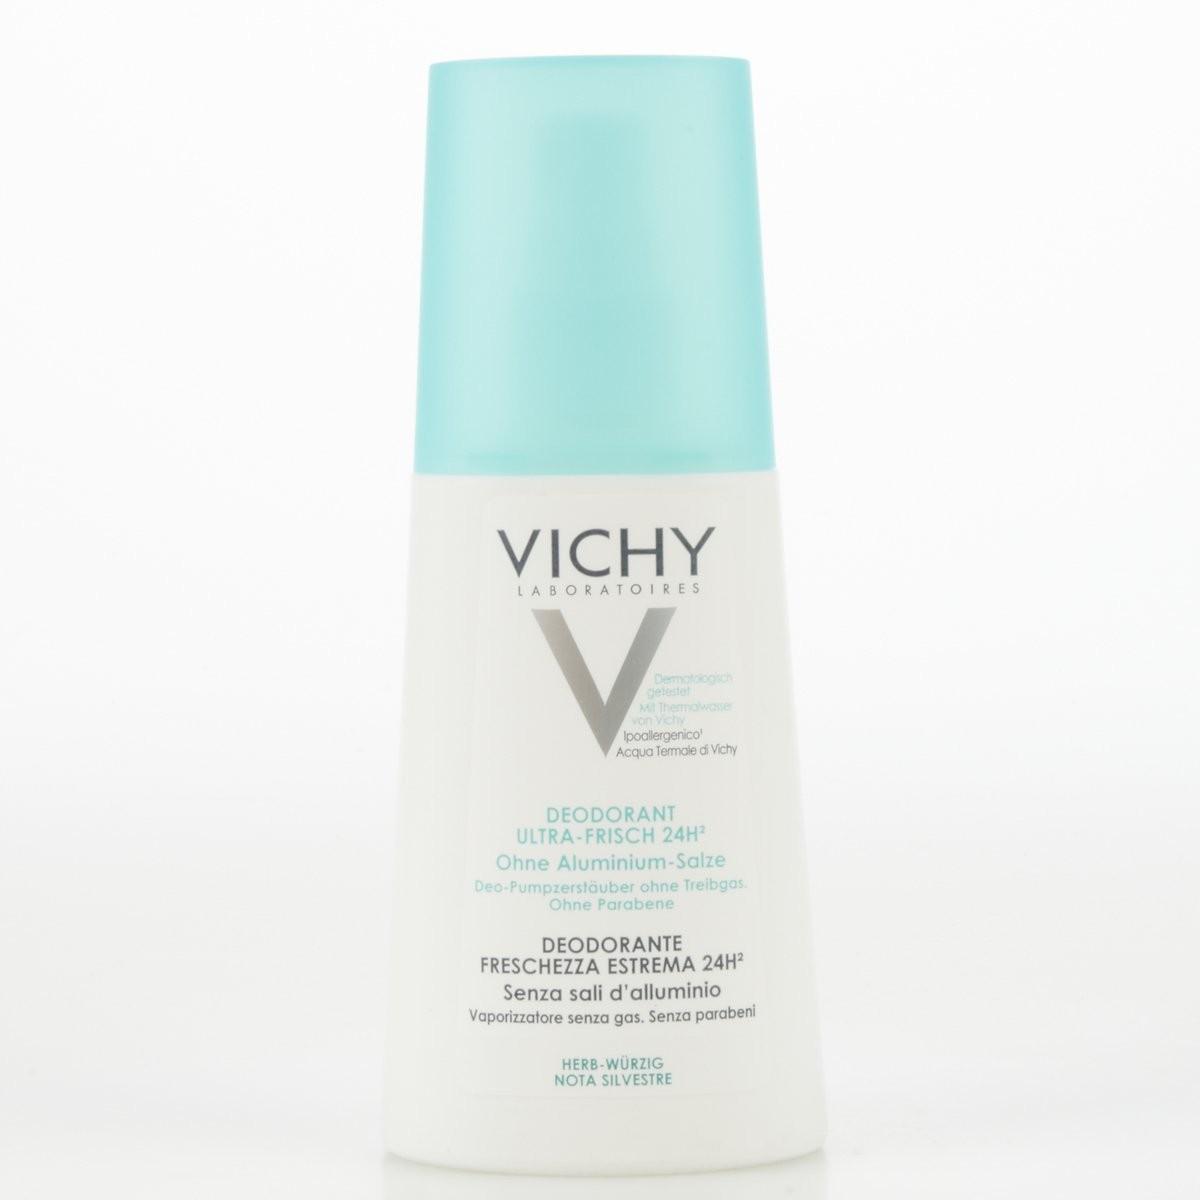 Vichy Deodorante vapo Freschezza Estrema